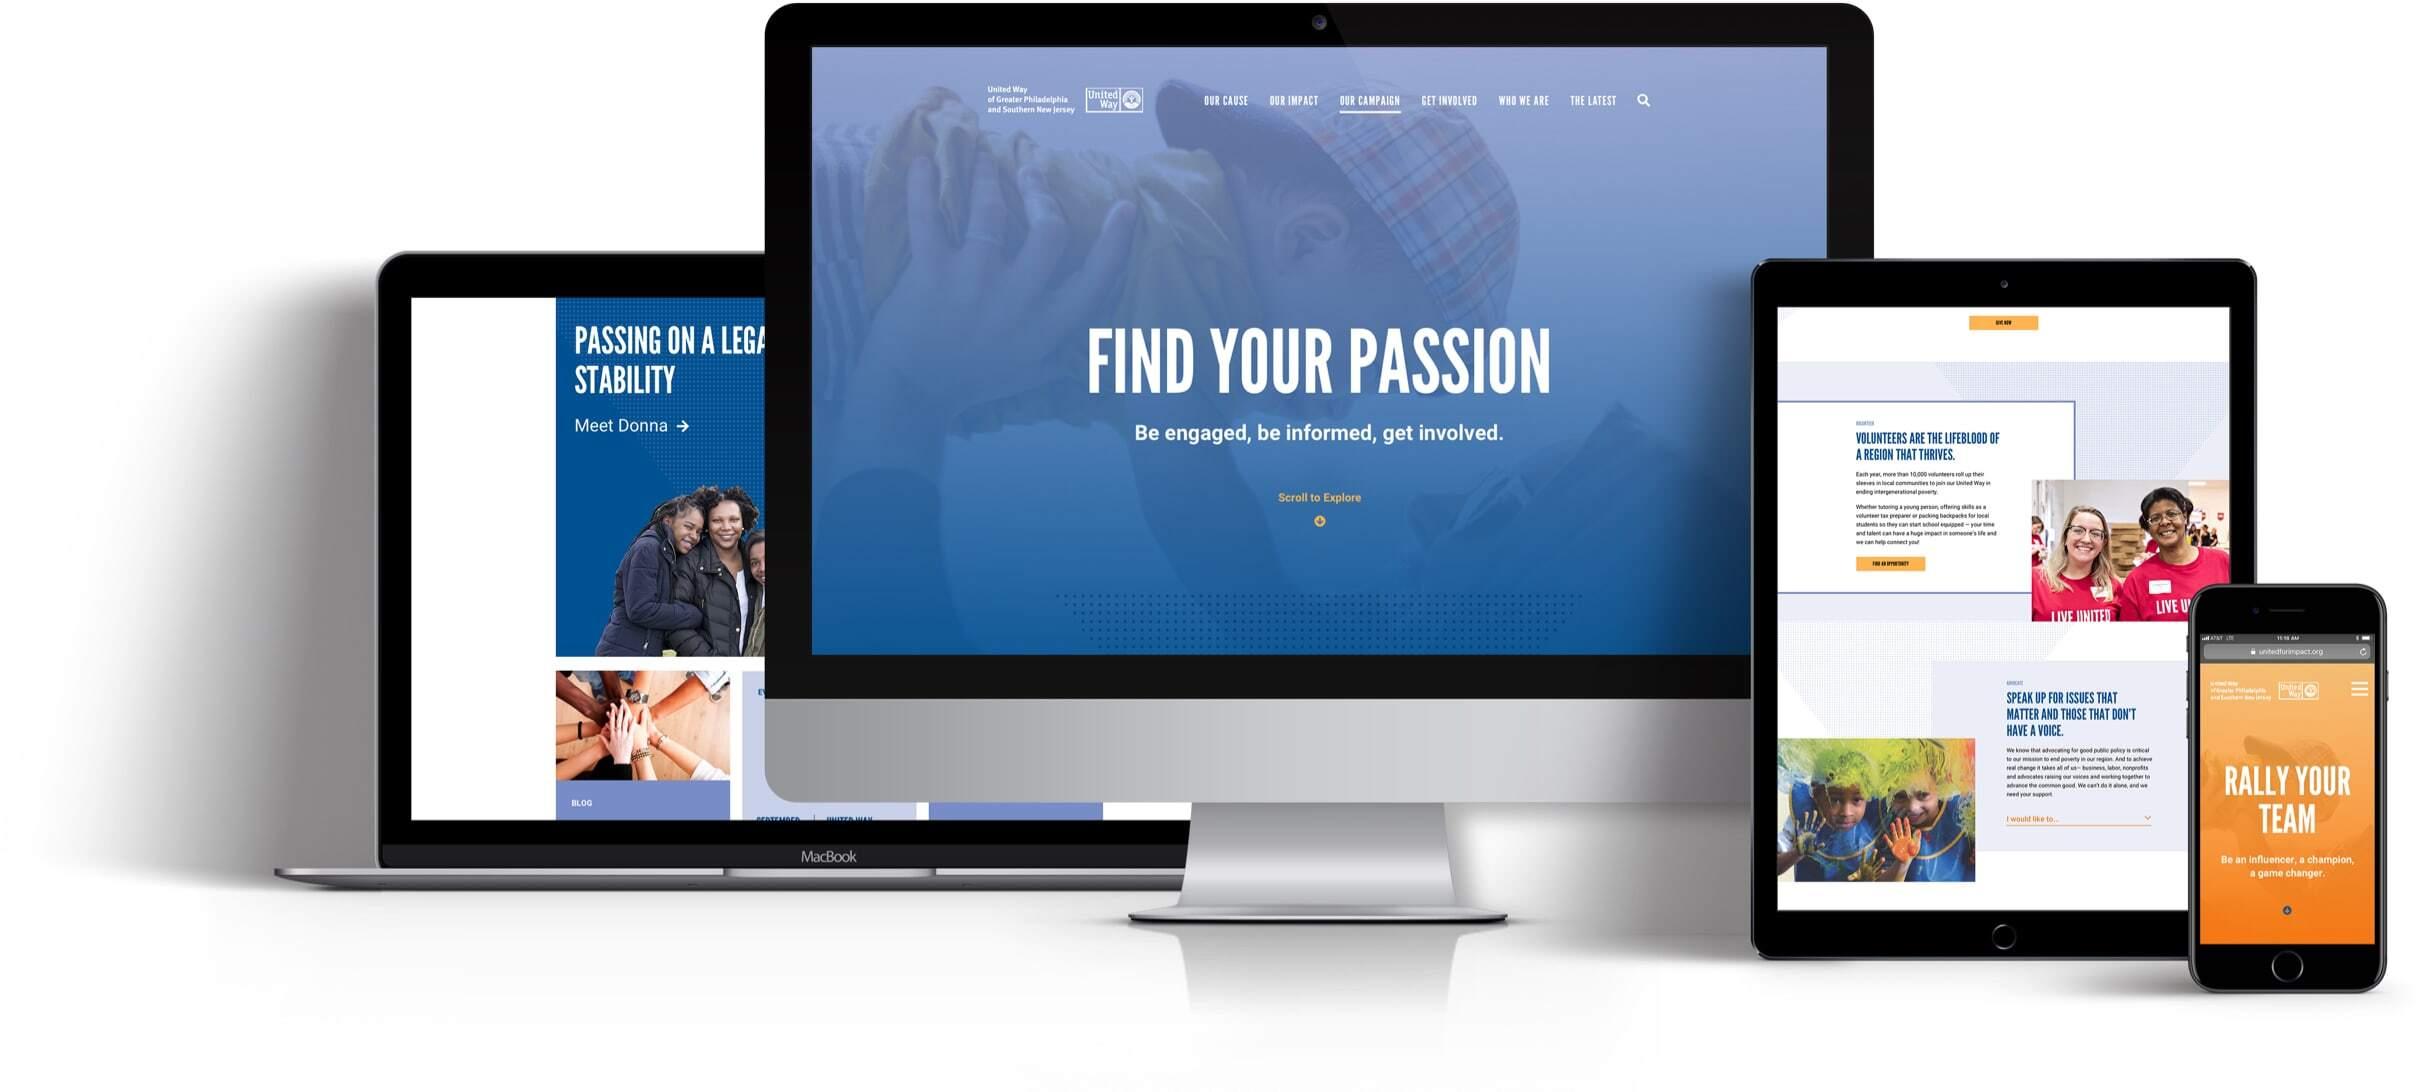 Uwpsnj2019 website devices fullwidth